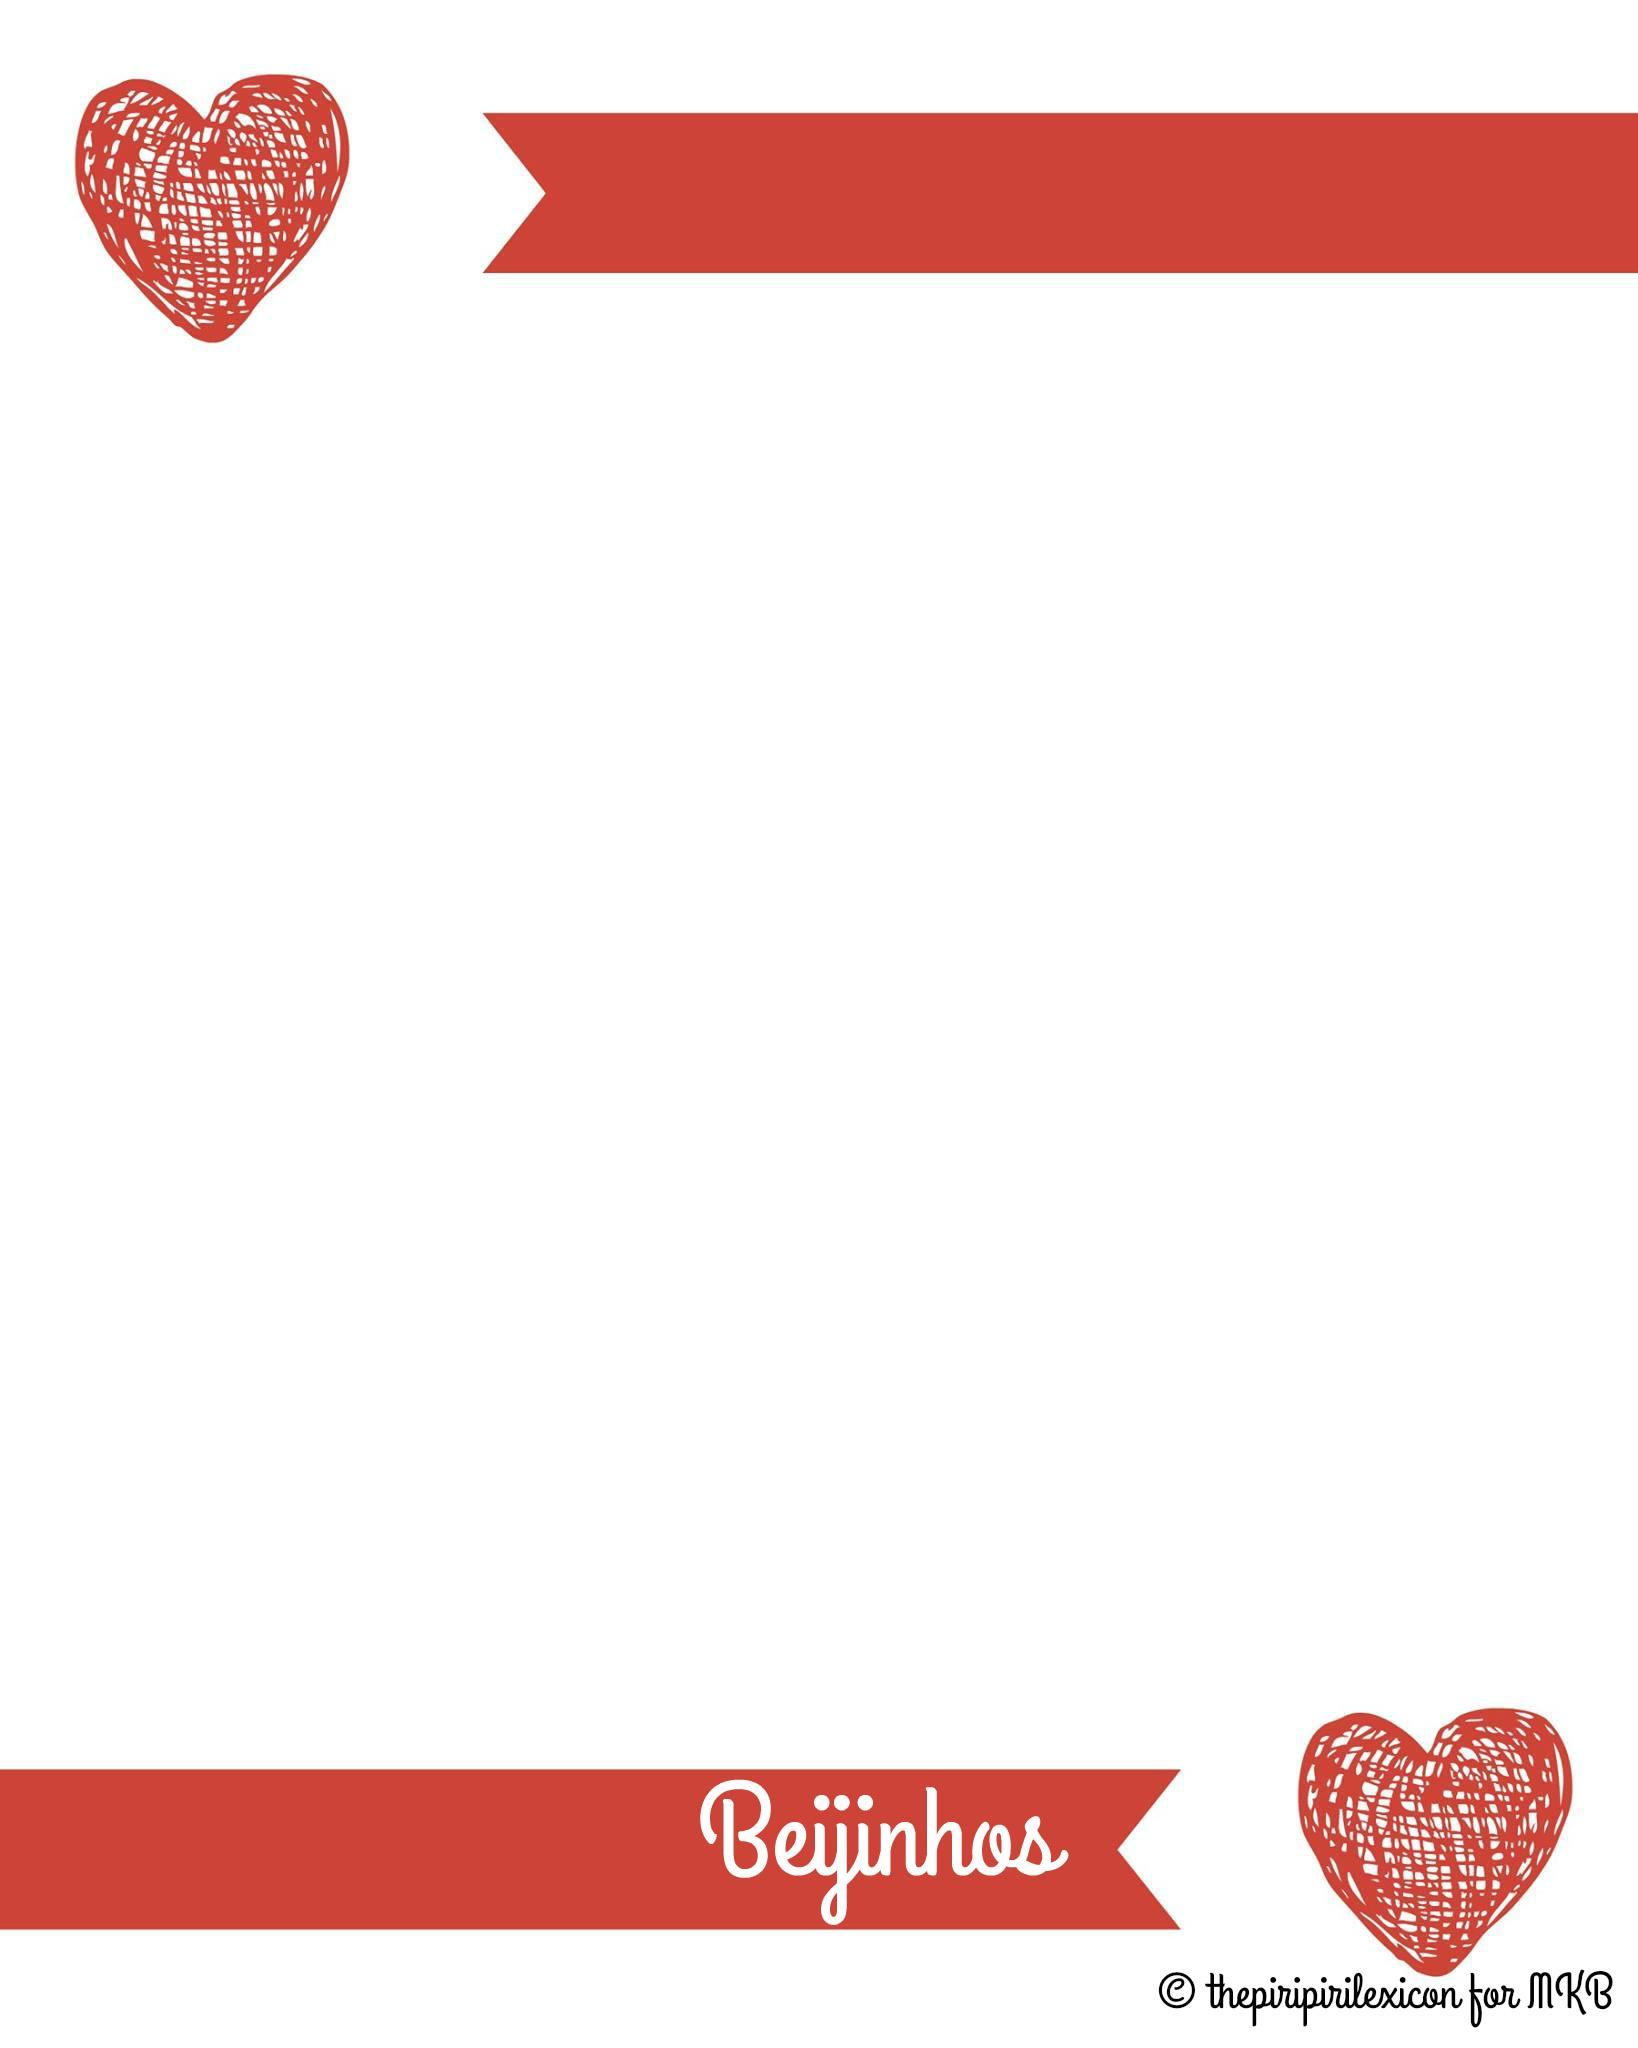 Portuguese Valentines Day love letter